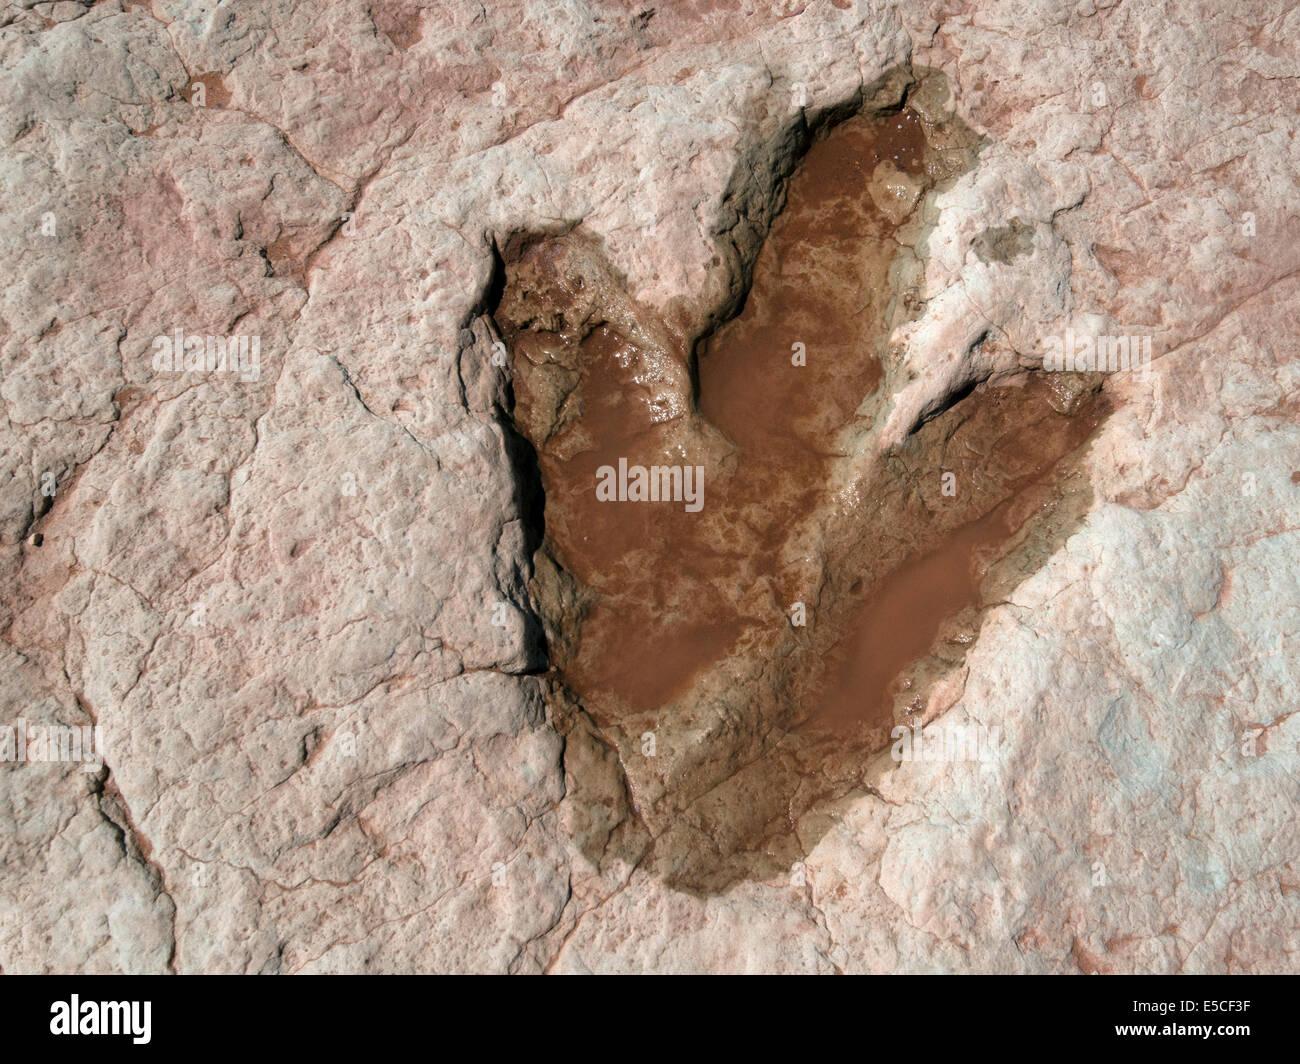 Dinosaur footprint, Moenkopi Dinosaur Tracks, Tuba, Arizona - Stock Image